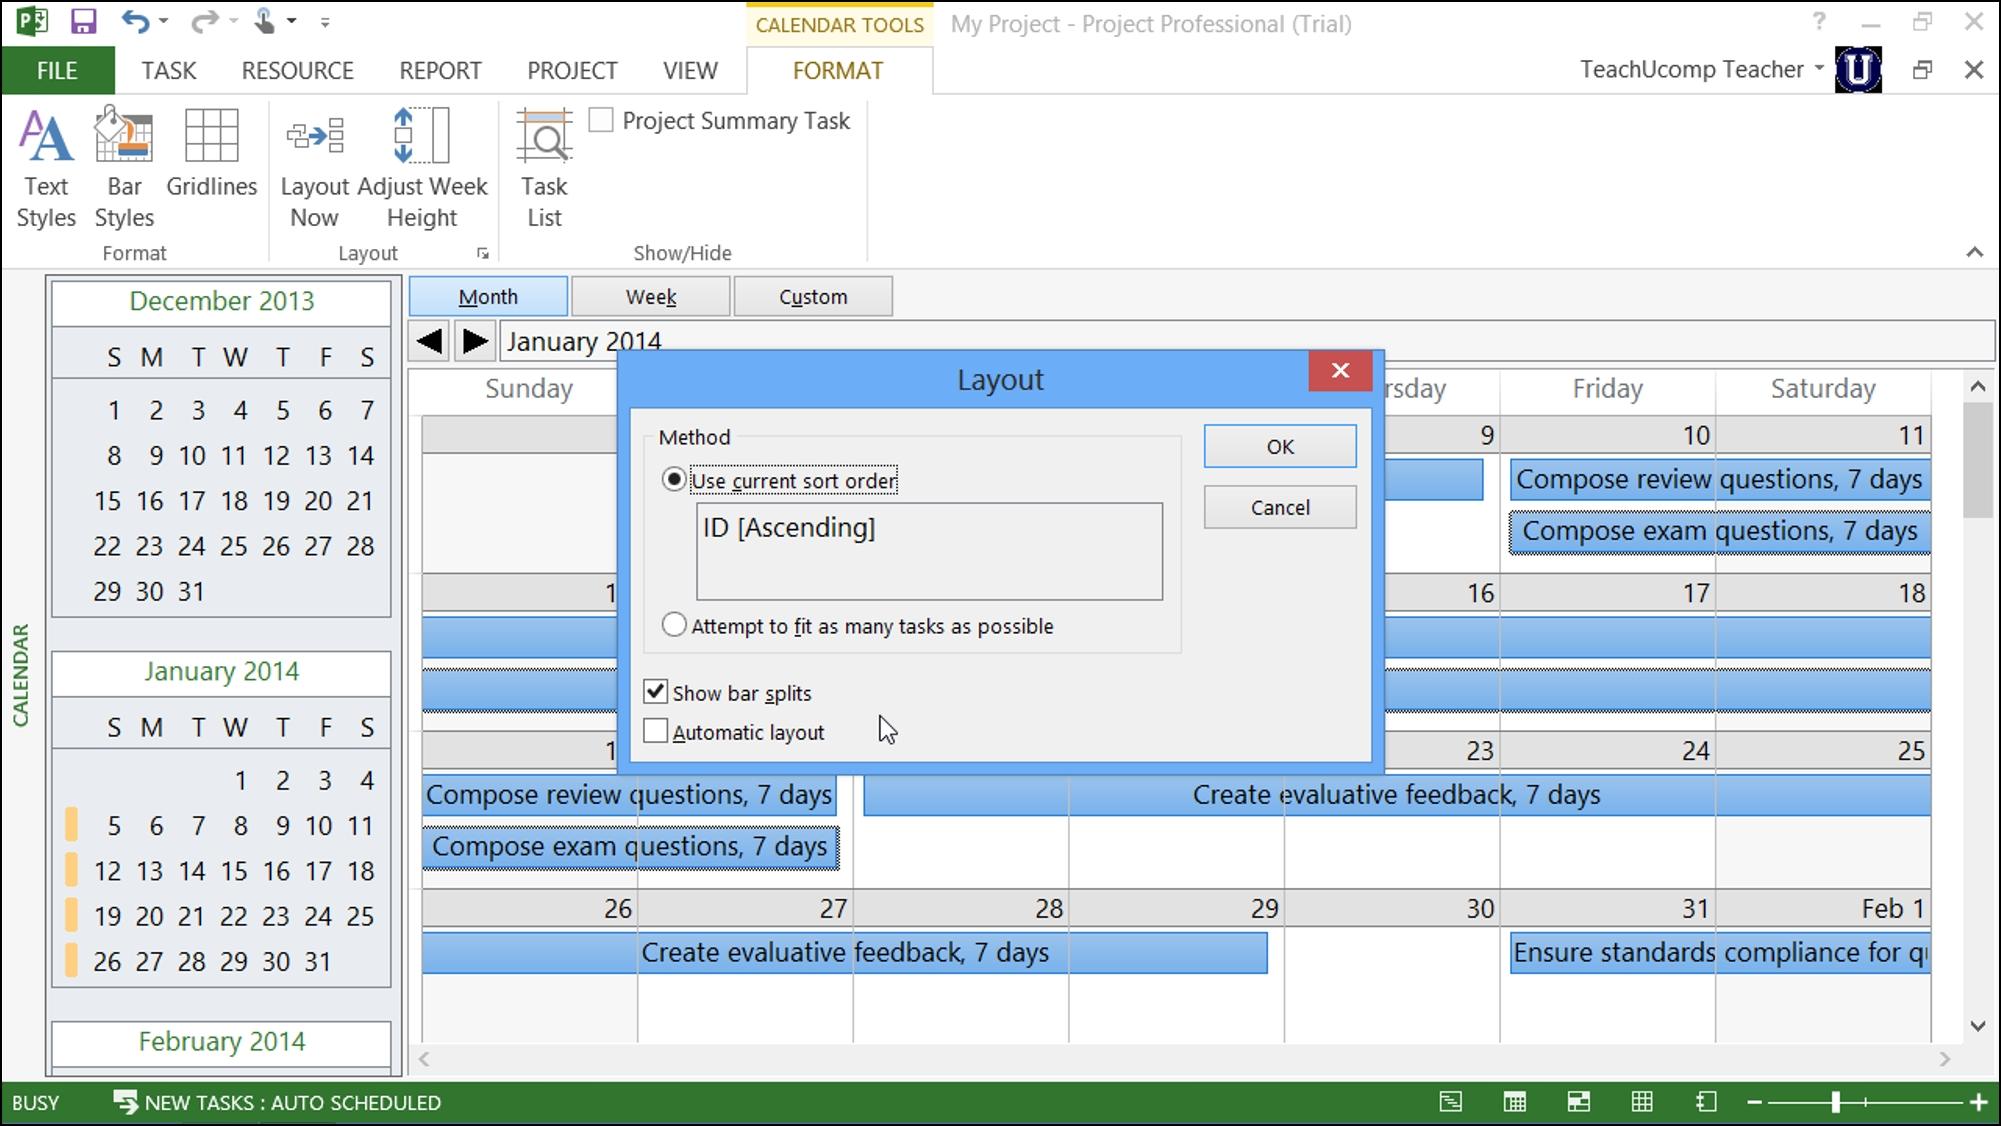 Calendar View In Microsoft Project - Tutorial